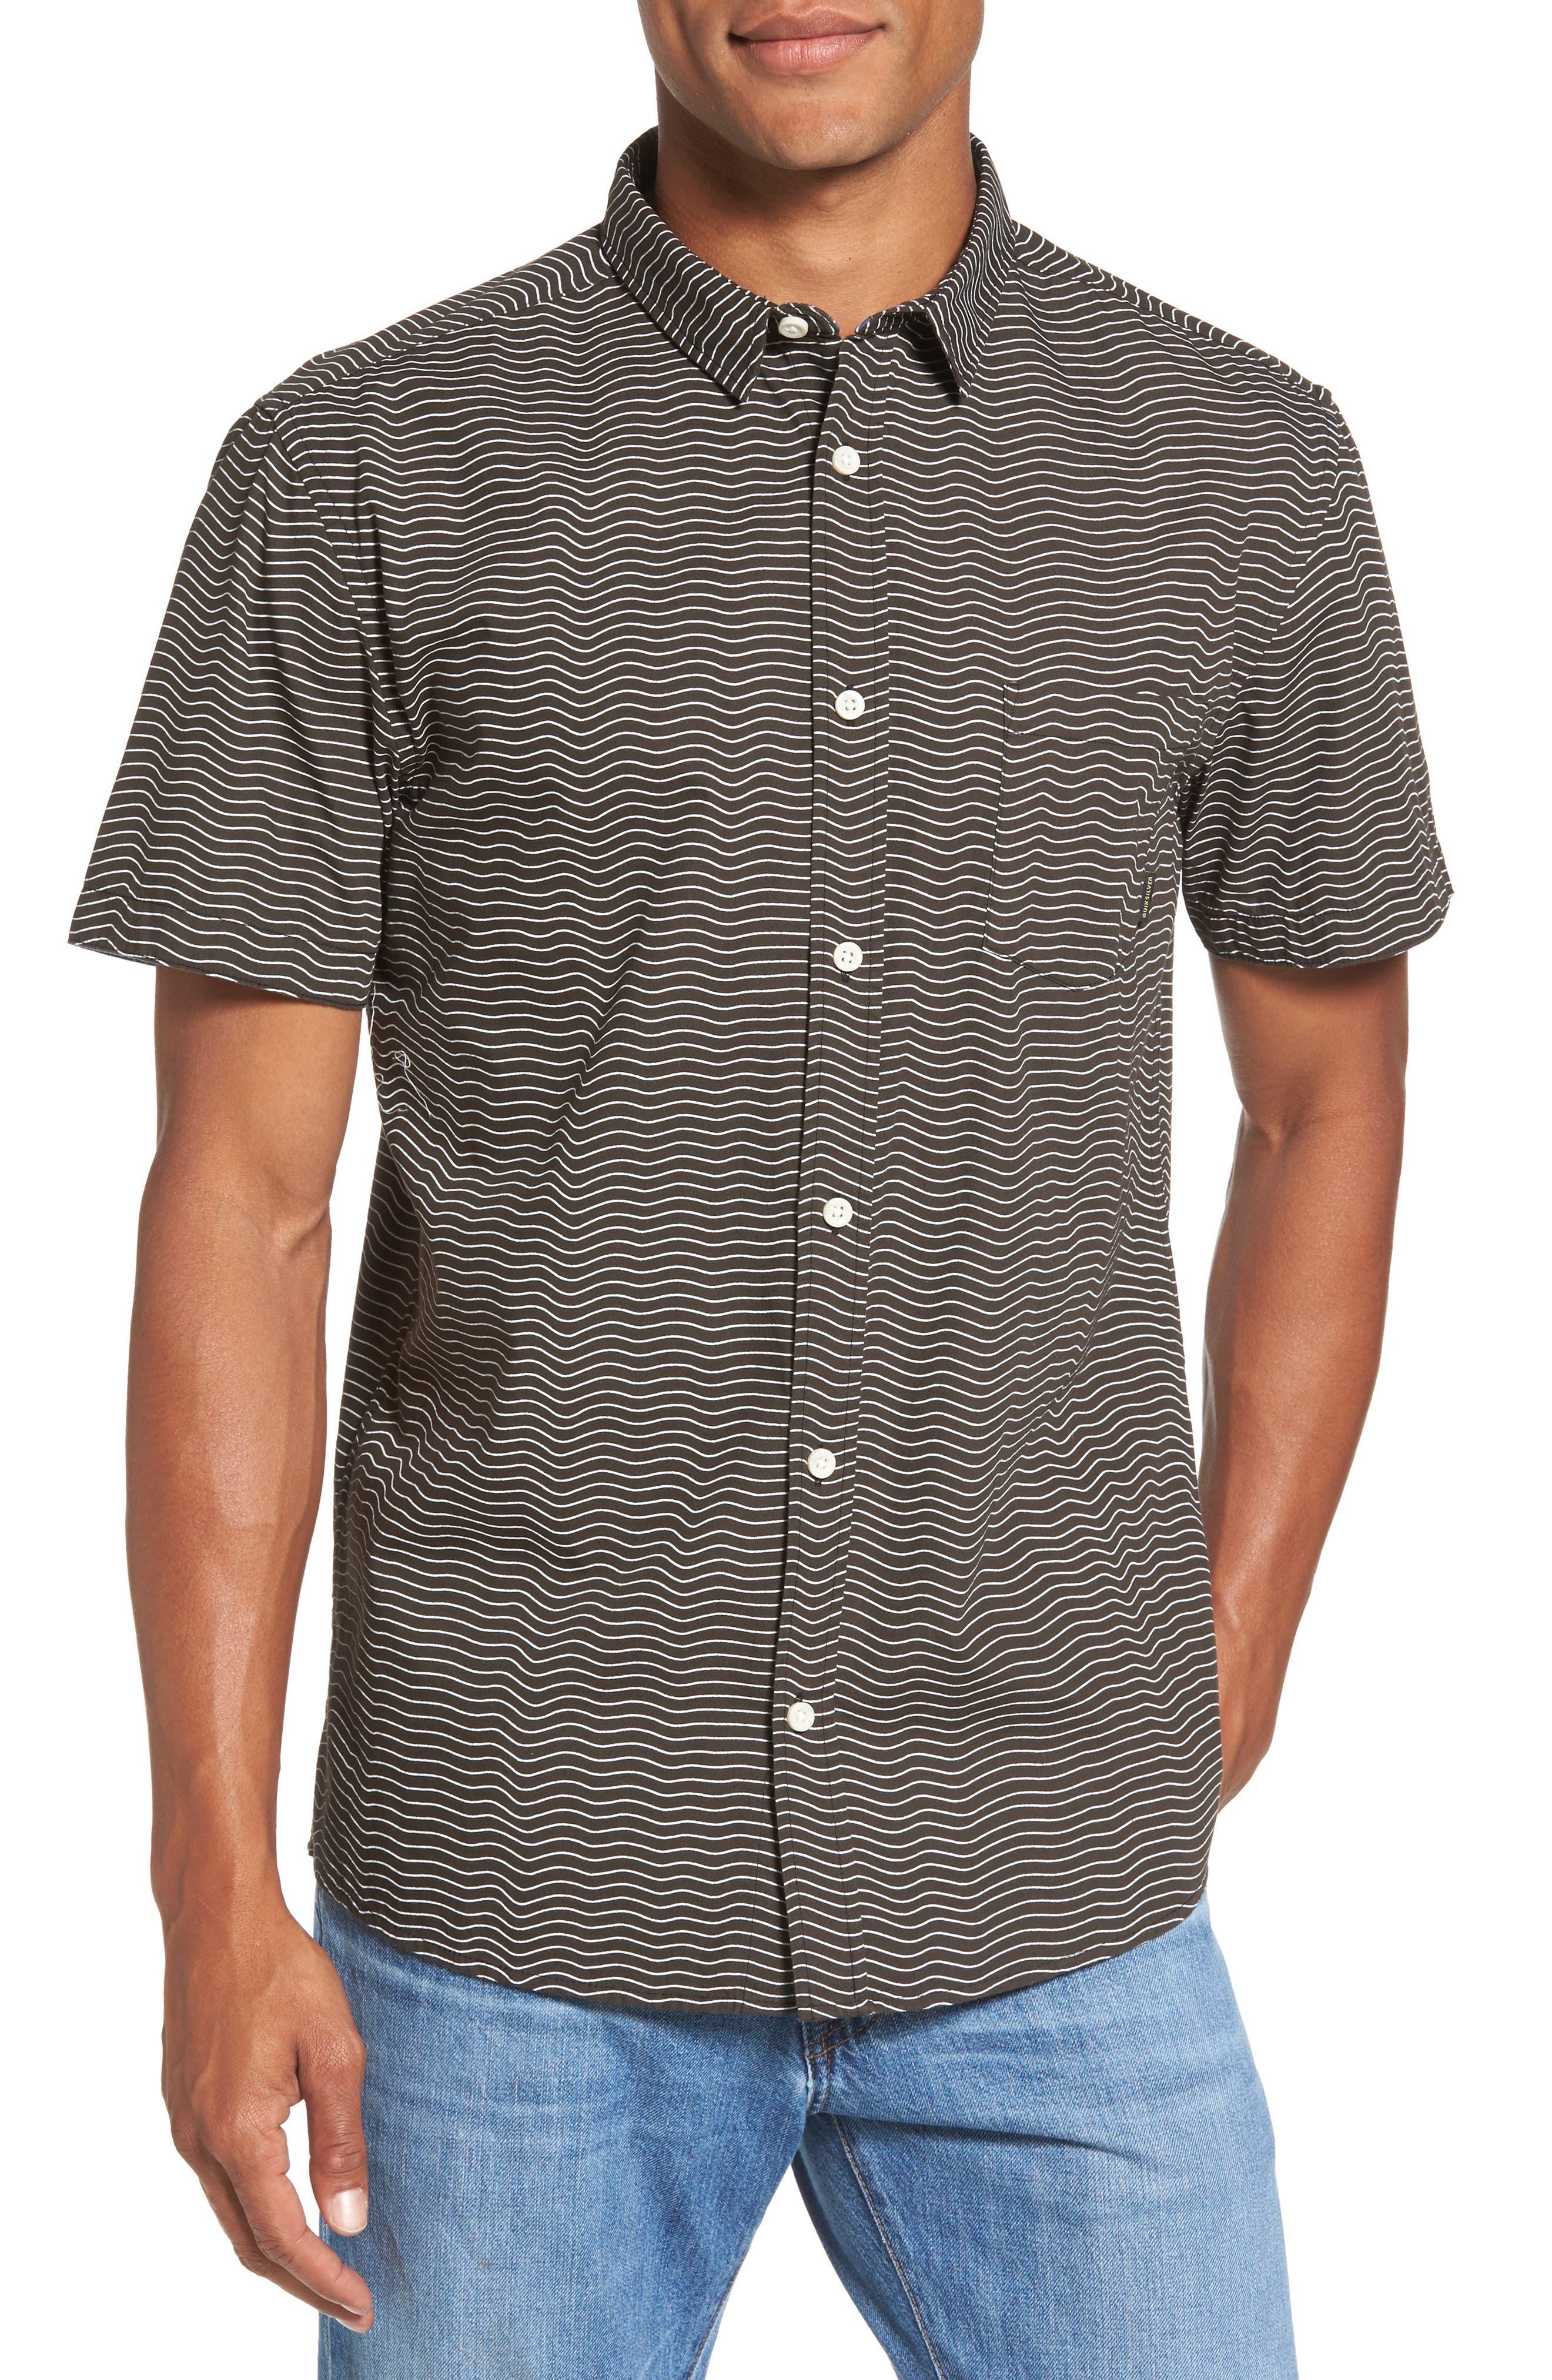 Heat Wave Stripe Shirt,                         Main,                         color, 002